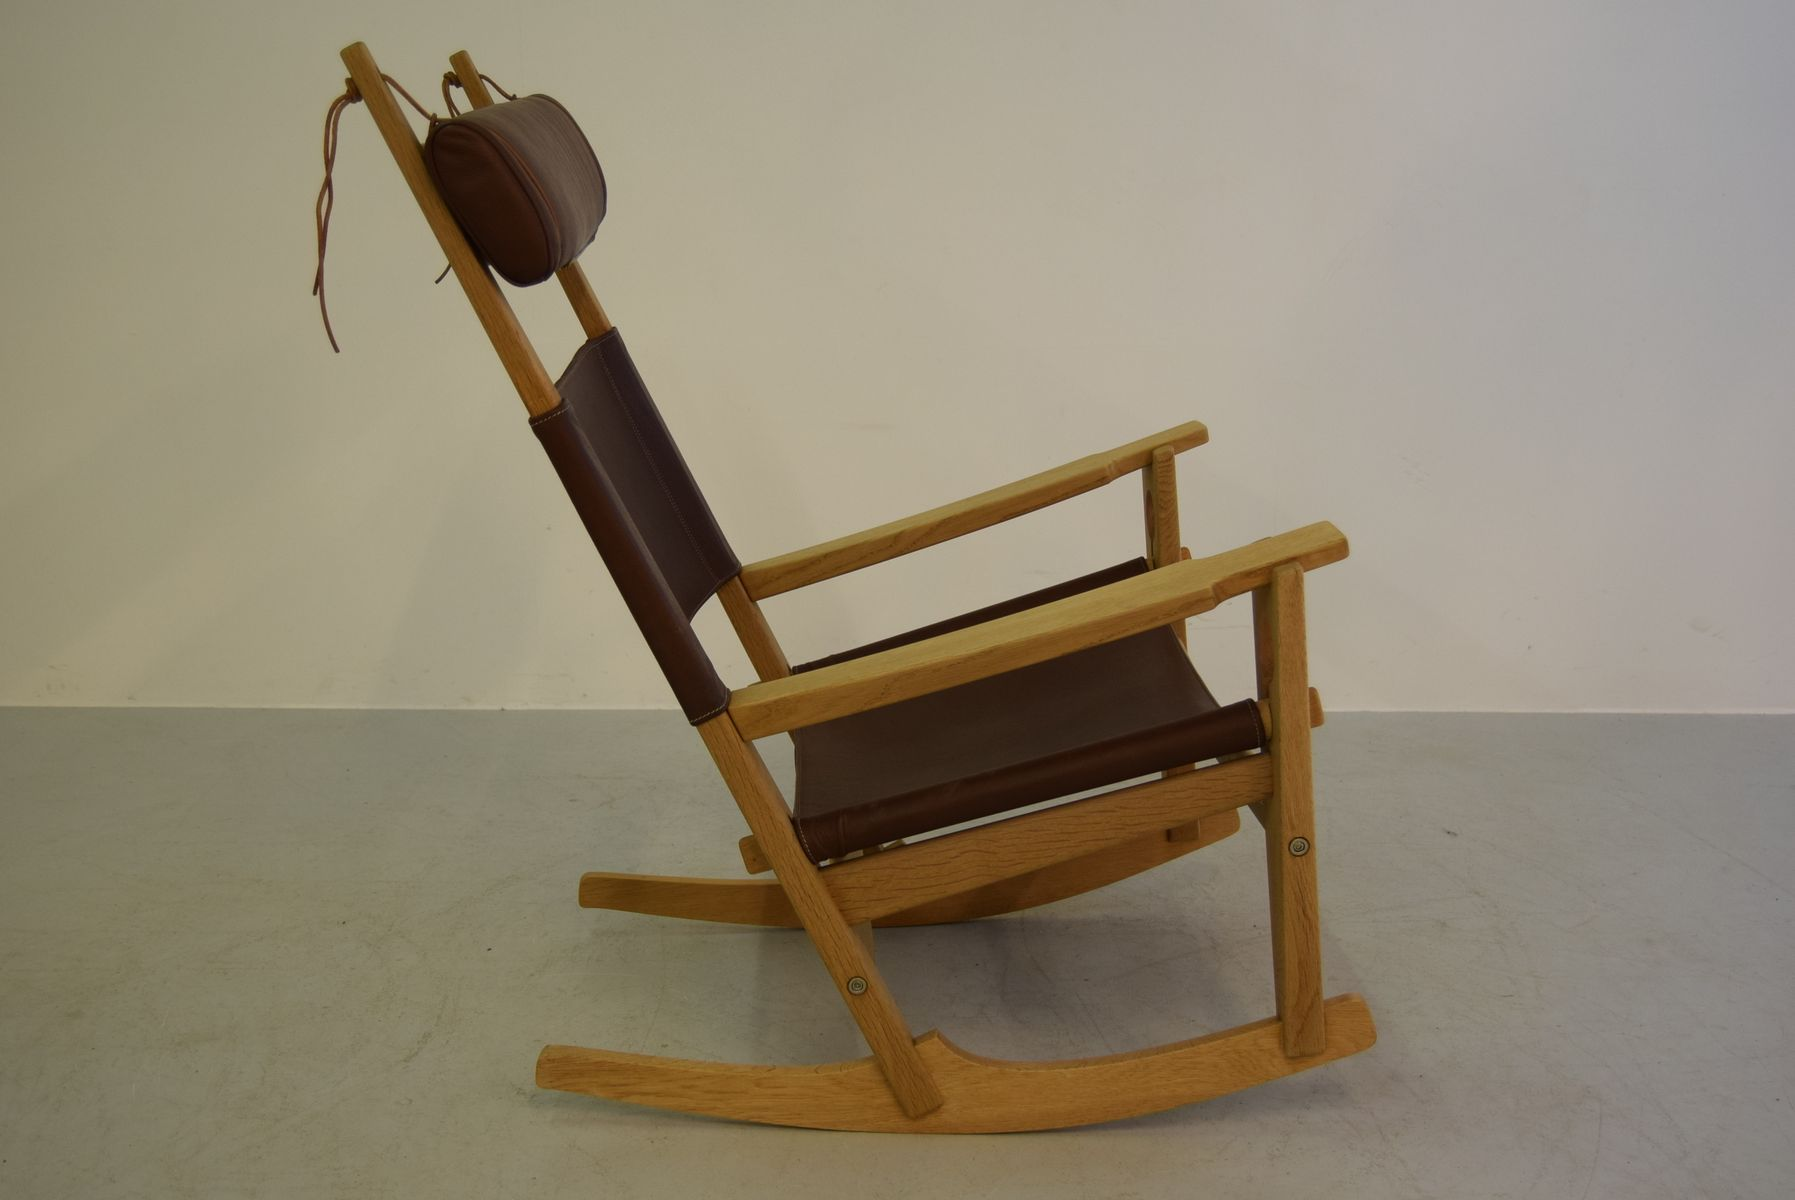 Keyhole Rocking Chair Model GE-673 by Hans J. Wegner for Getama, 1960s ...